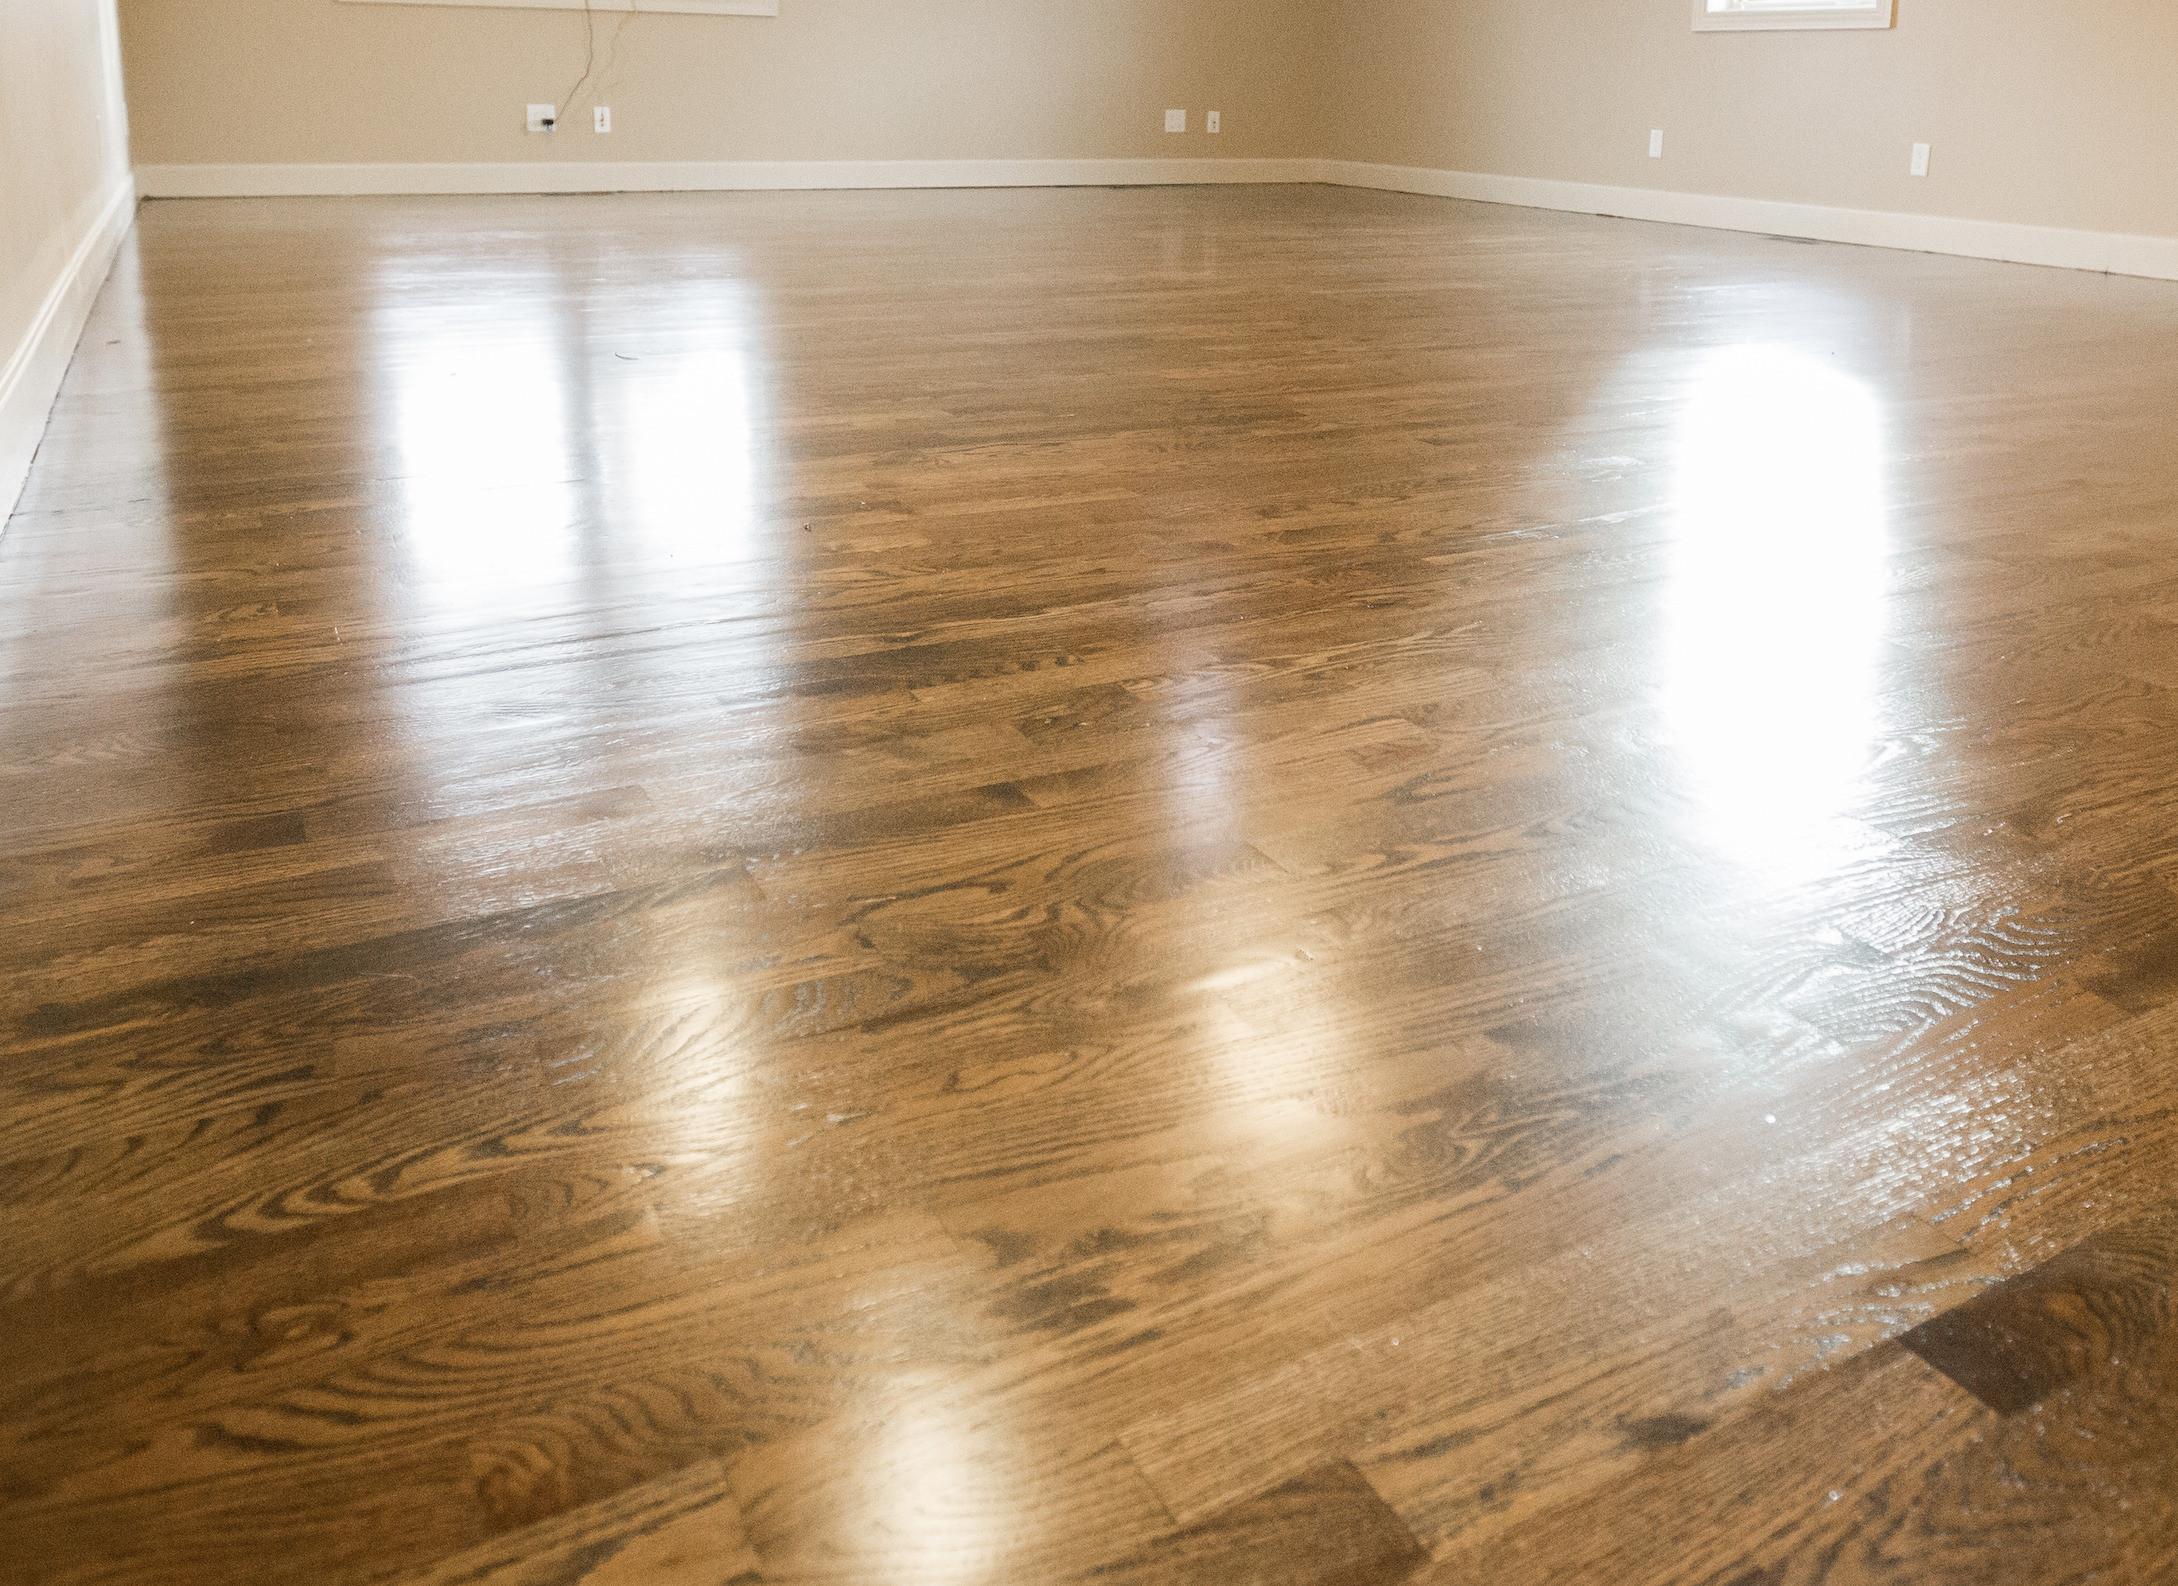 hardwood floor refinishing orange county of hardwood floor refinishing floor plan ideas intended for hardwood floor refinishing pin by rippnfinish on dark hardwoods